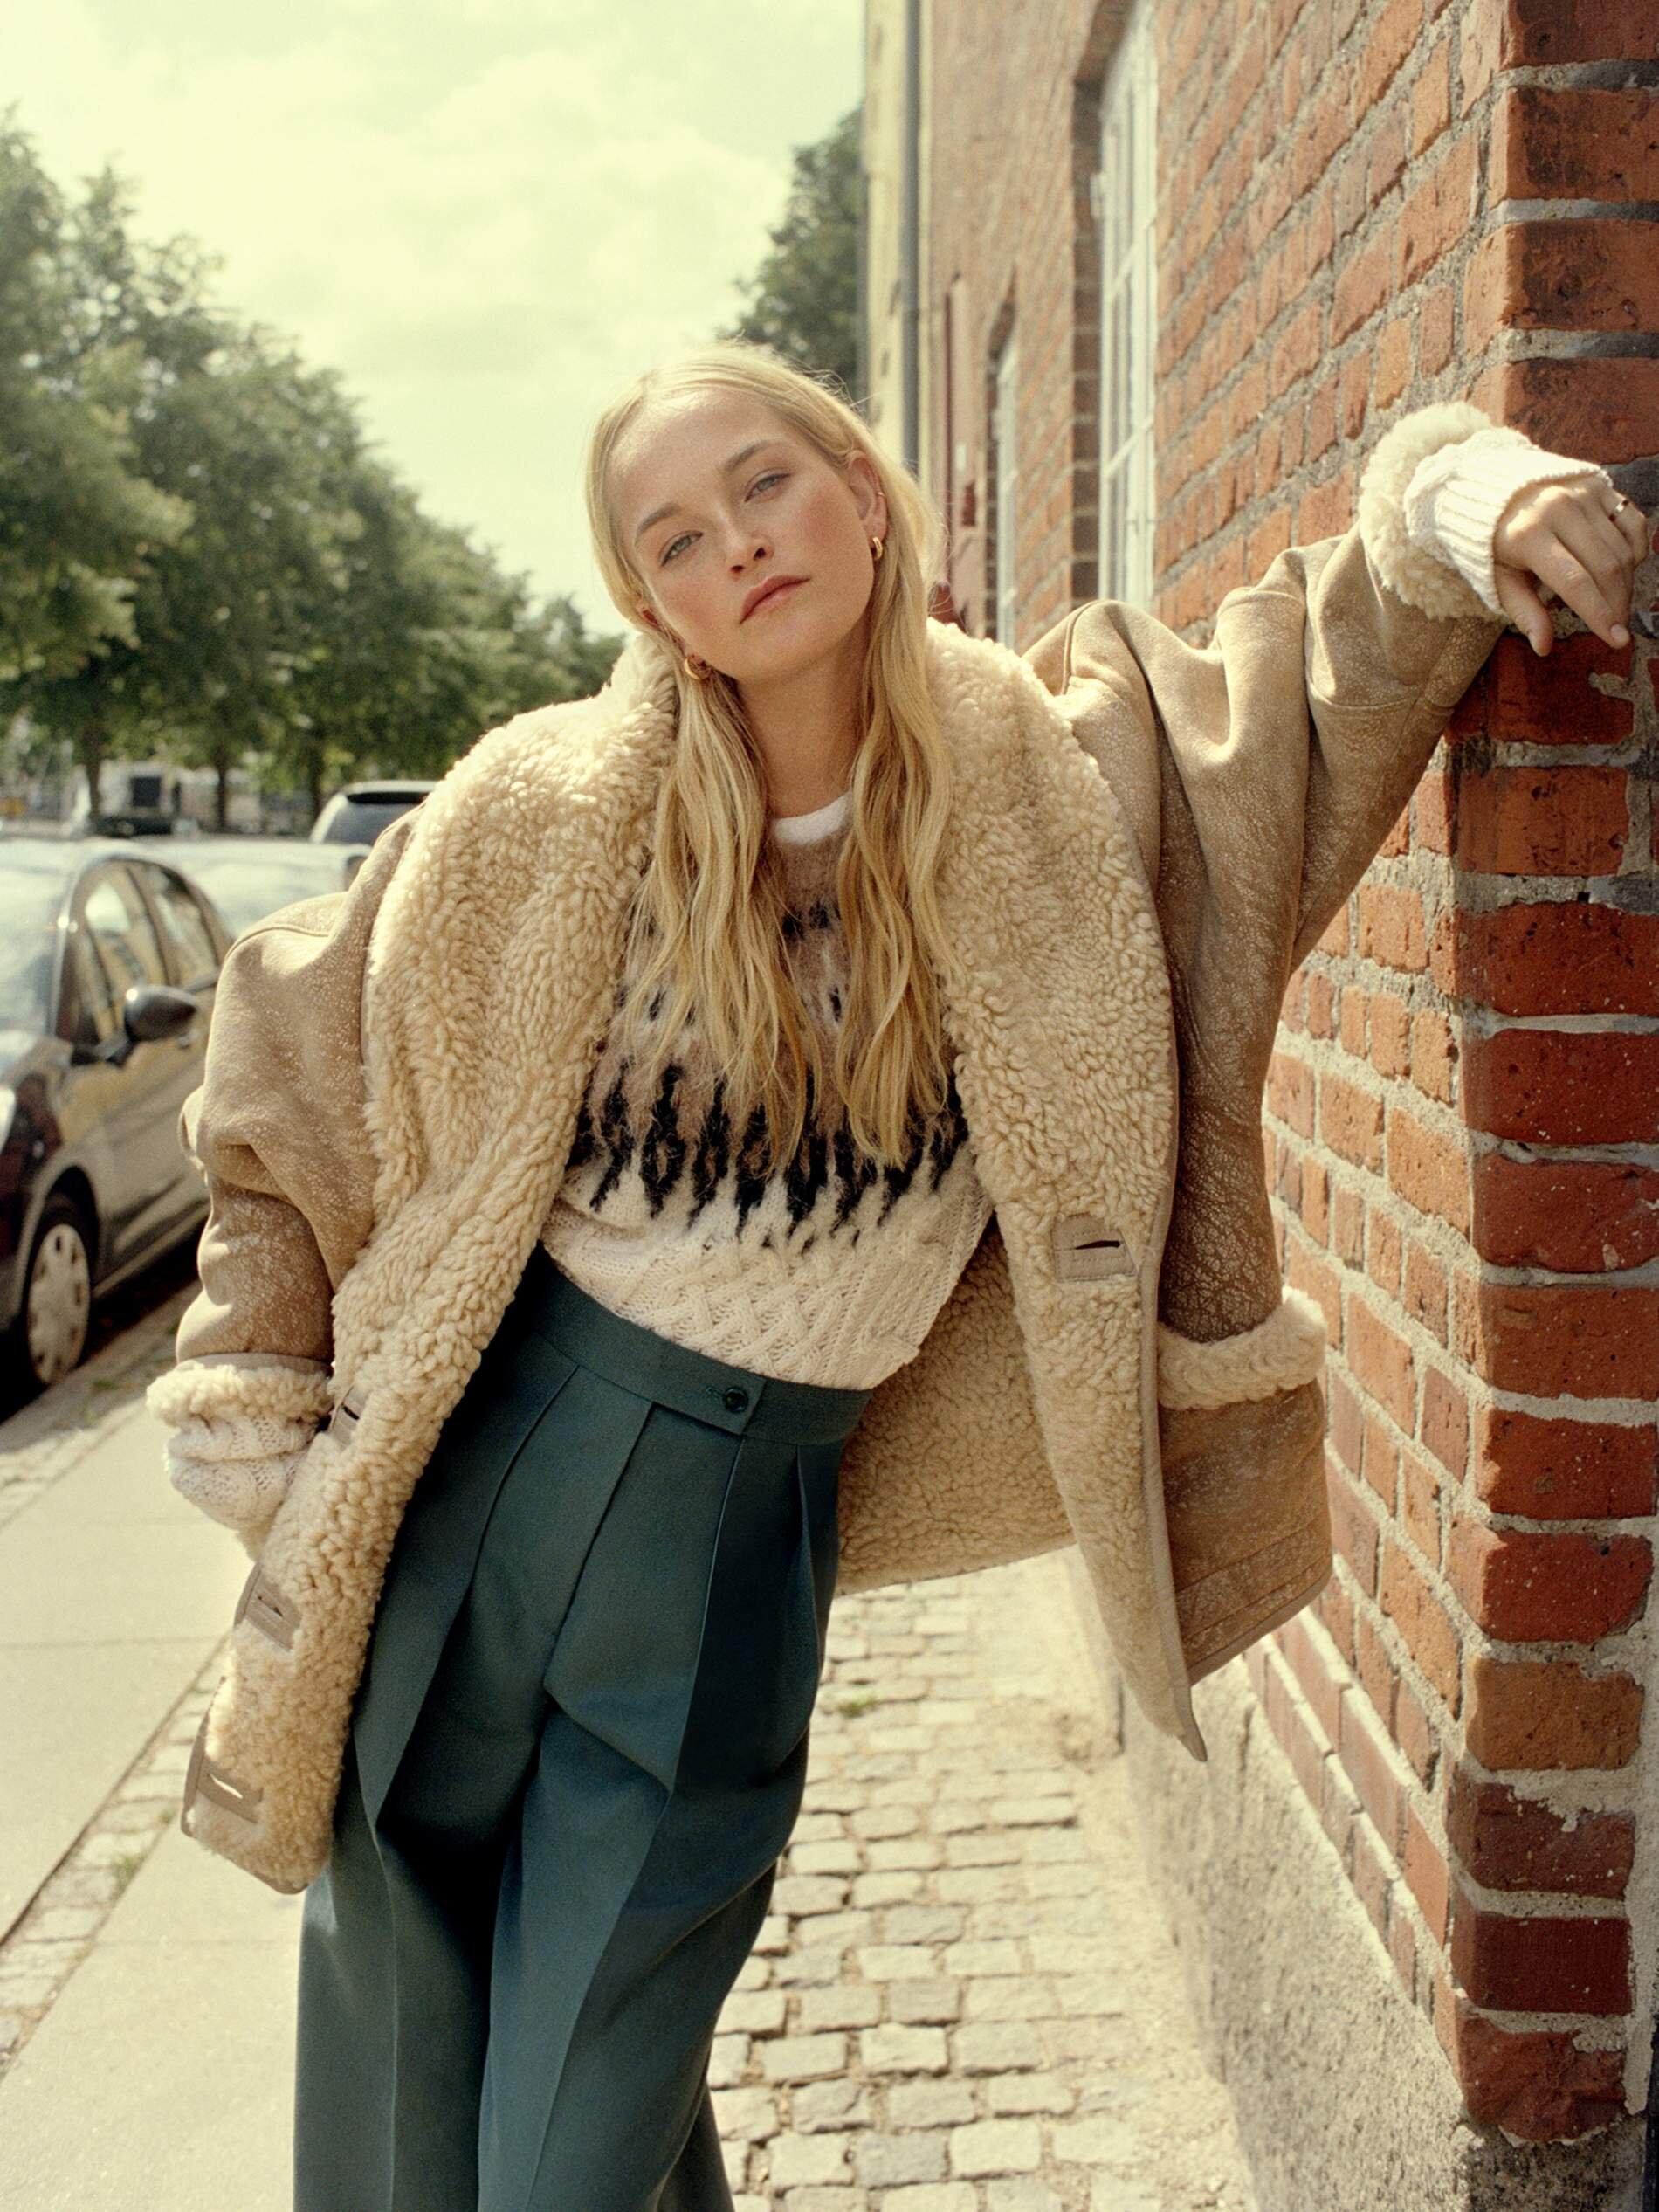 Image Jean Campbell by Quentin De Briey for Porter Edit. Coat, Isabel Marant; sweater, Altuzarra; pants, Acne Studios; earrings, Sophie Buhai; ring, Grace Lee.